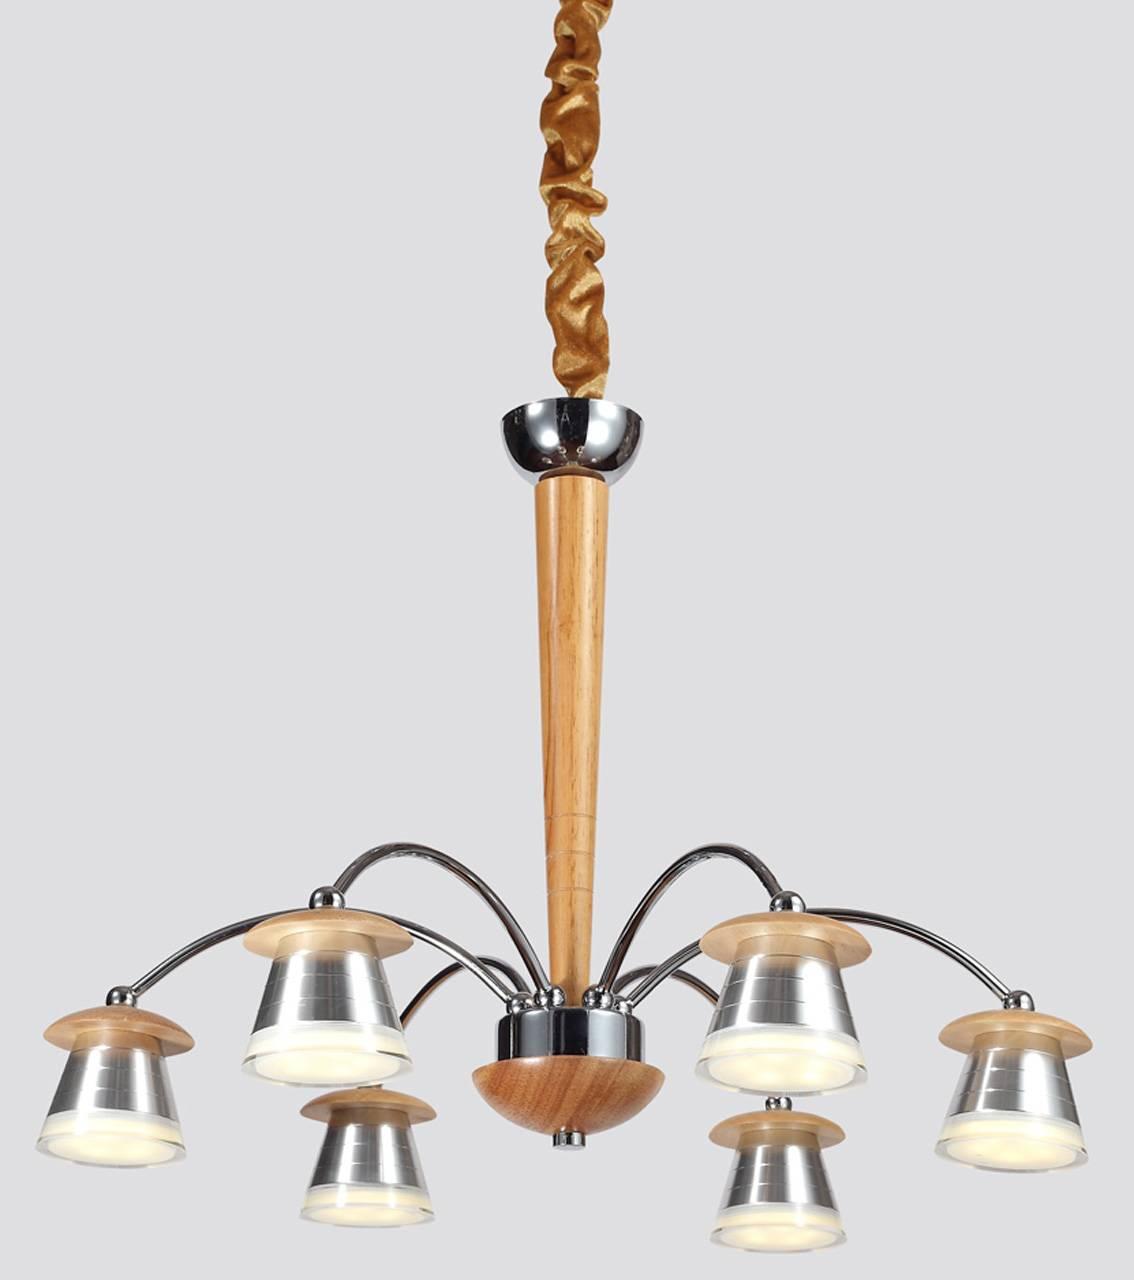 Подвесной светильник Lucia Tucci, LED, 30 Вт lucia tucci люстра natura 073 6 led